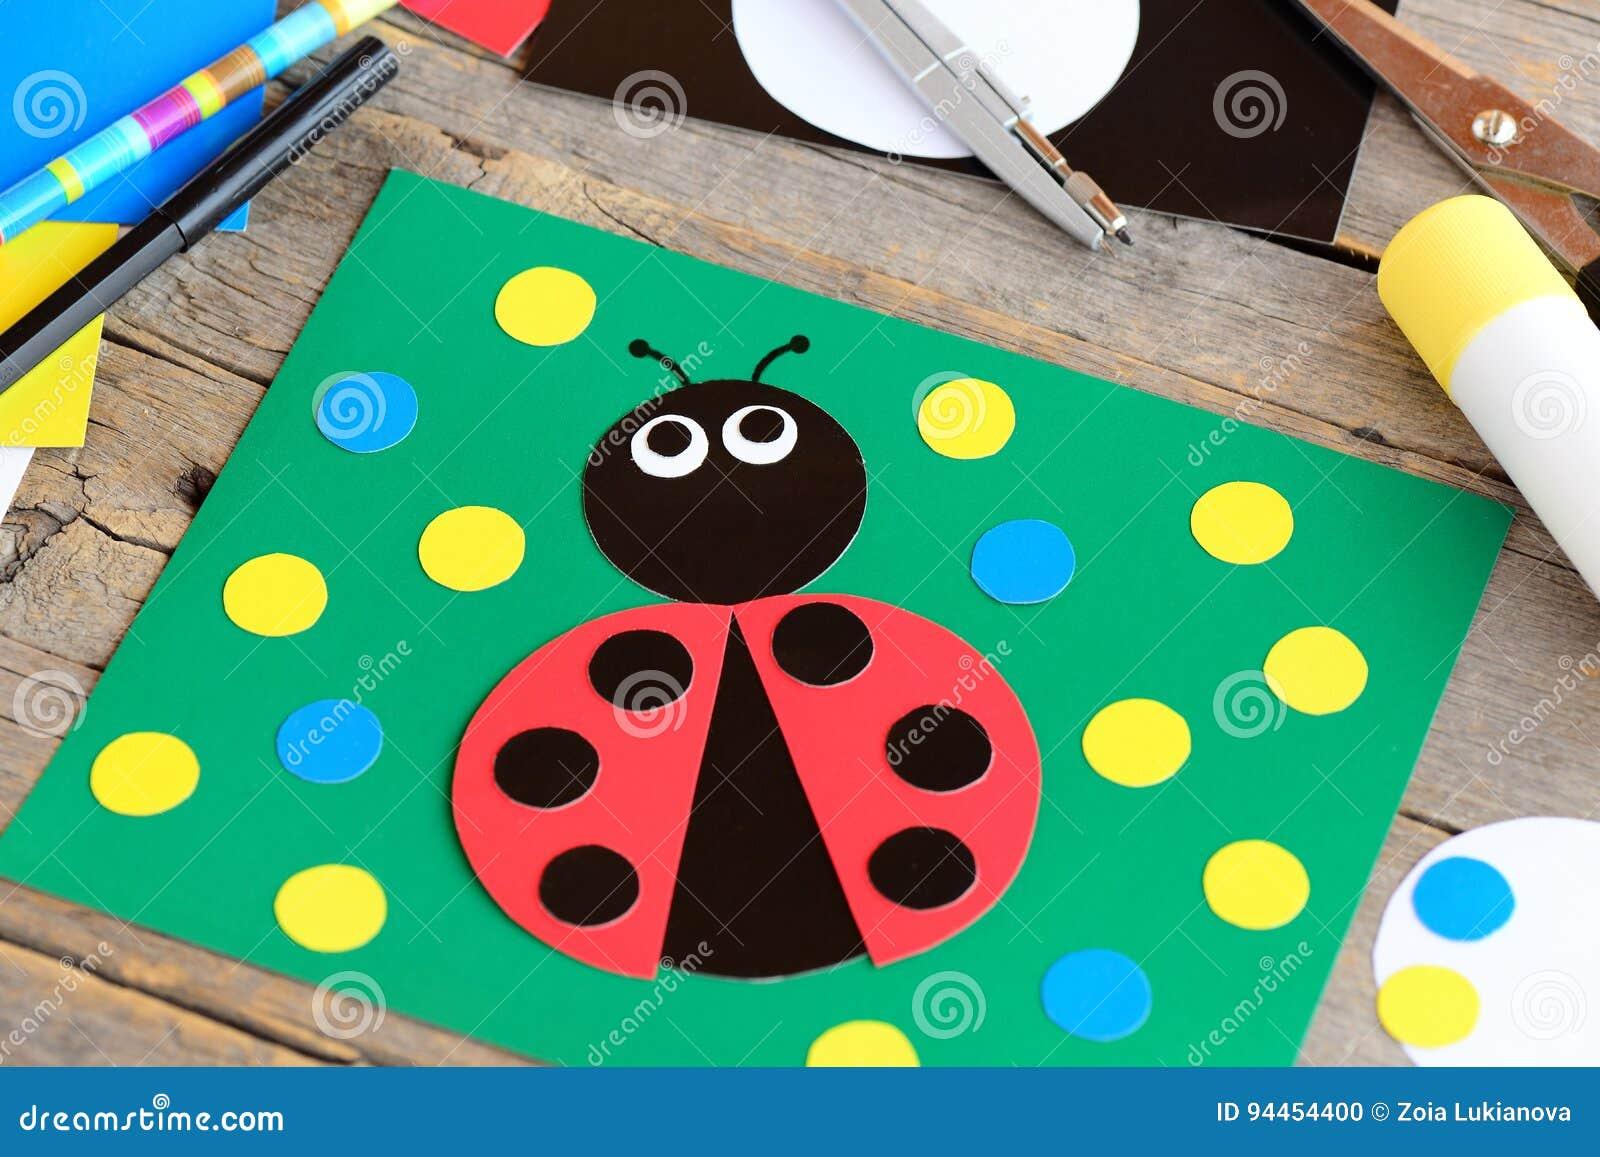 Ladybug Paper Collage Ladybug Card Stationery On A Vintage Wooden